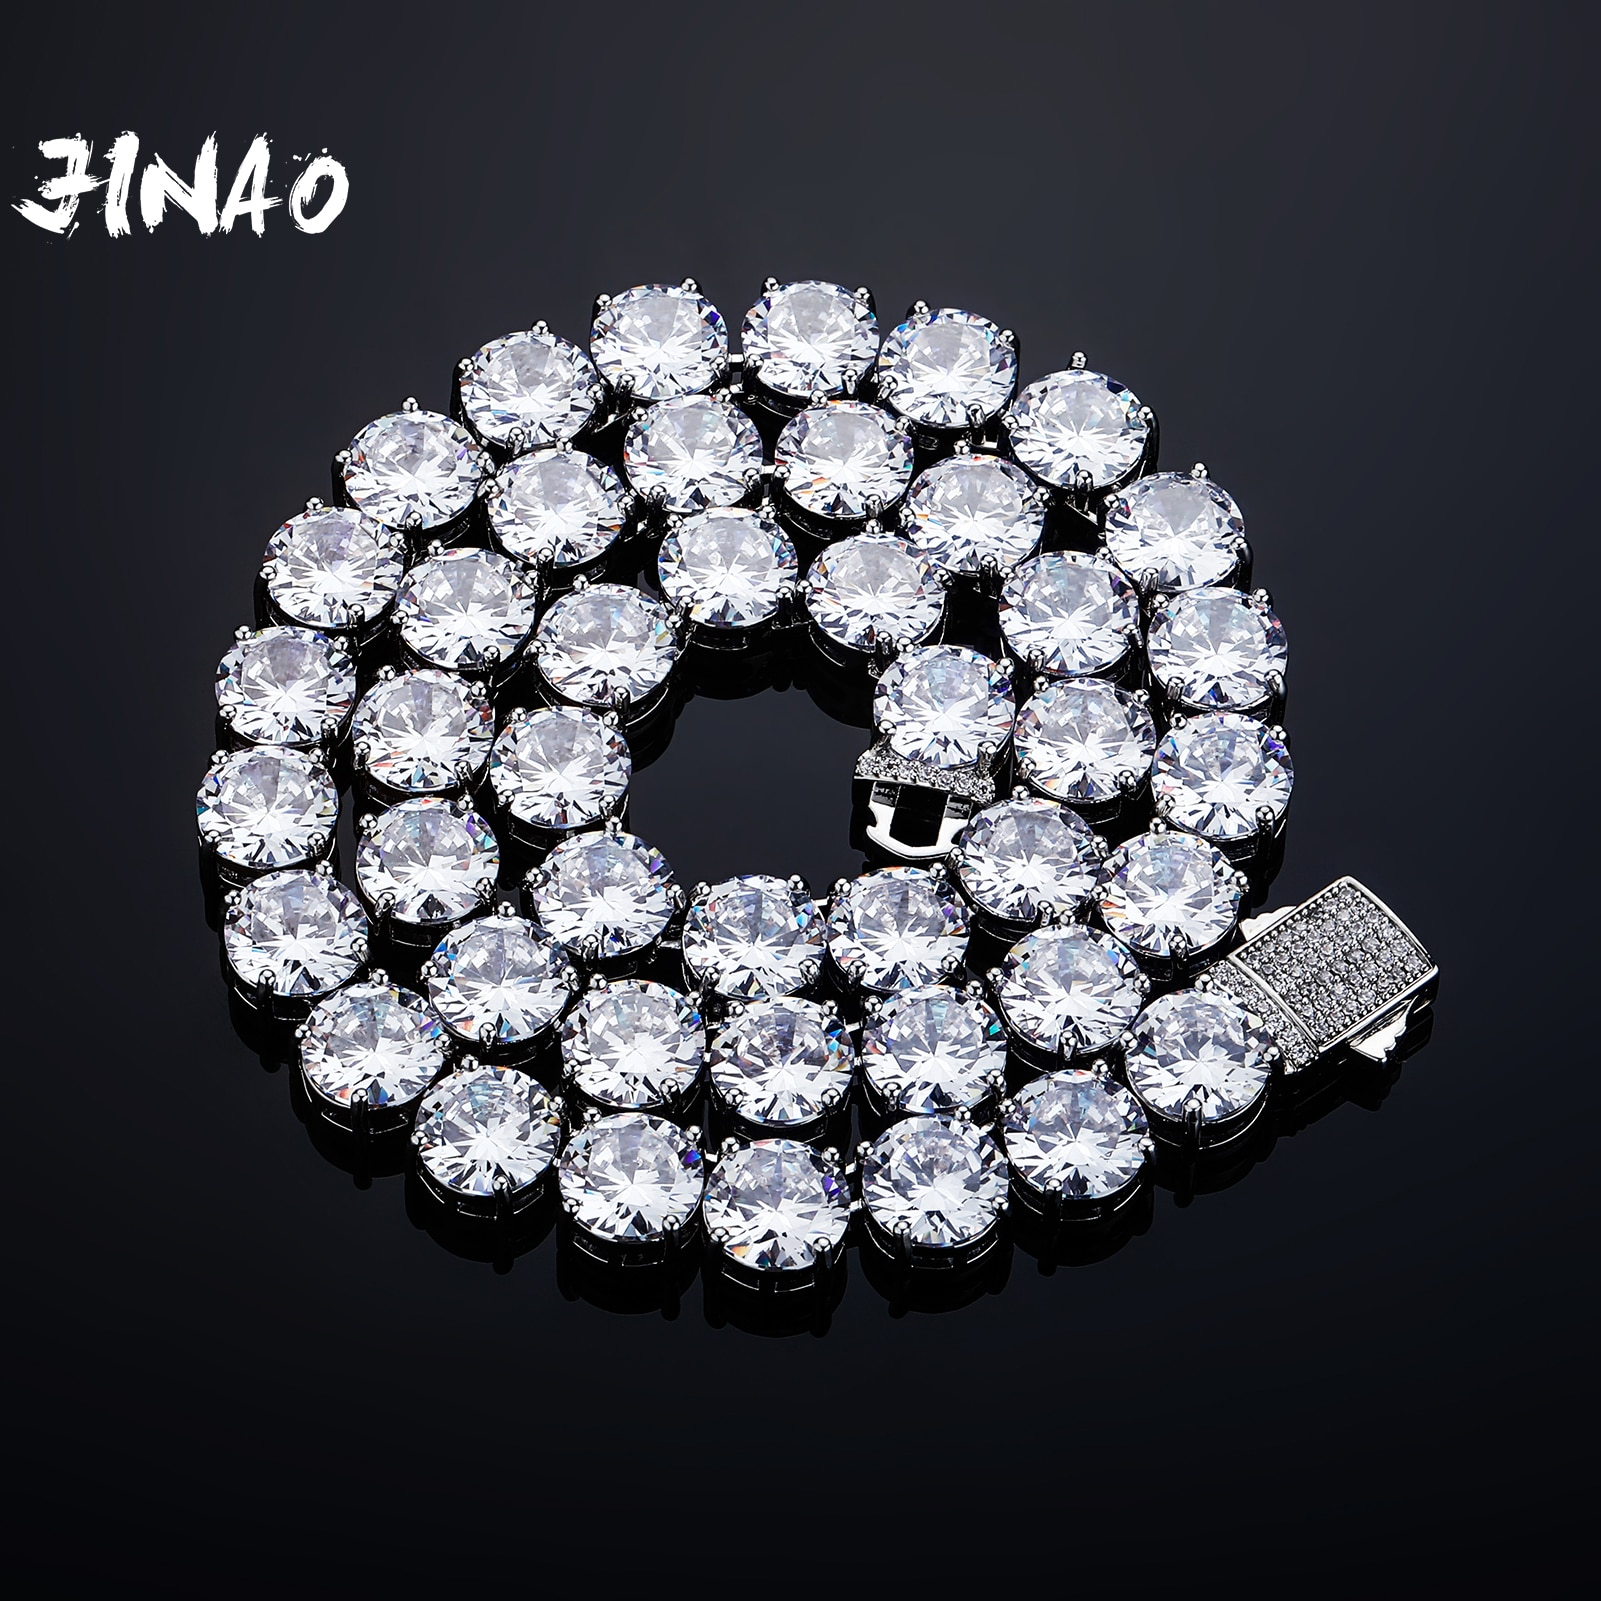 JINAO 2021 جديد 10 مللي متر الربيع مشبك تنس سلسلة عالية الجودة شخصية مثلج خارج AAA + قلادة تشيكوسلوفاكيا مجوهرات للهدايا